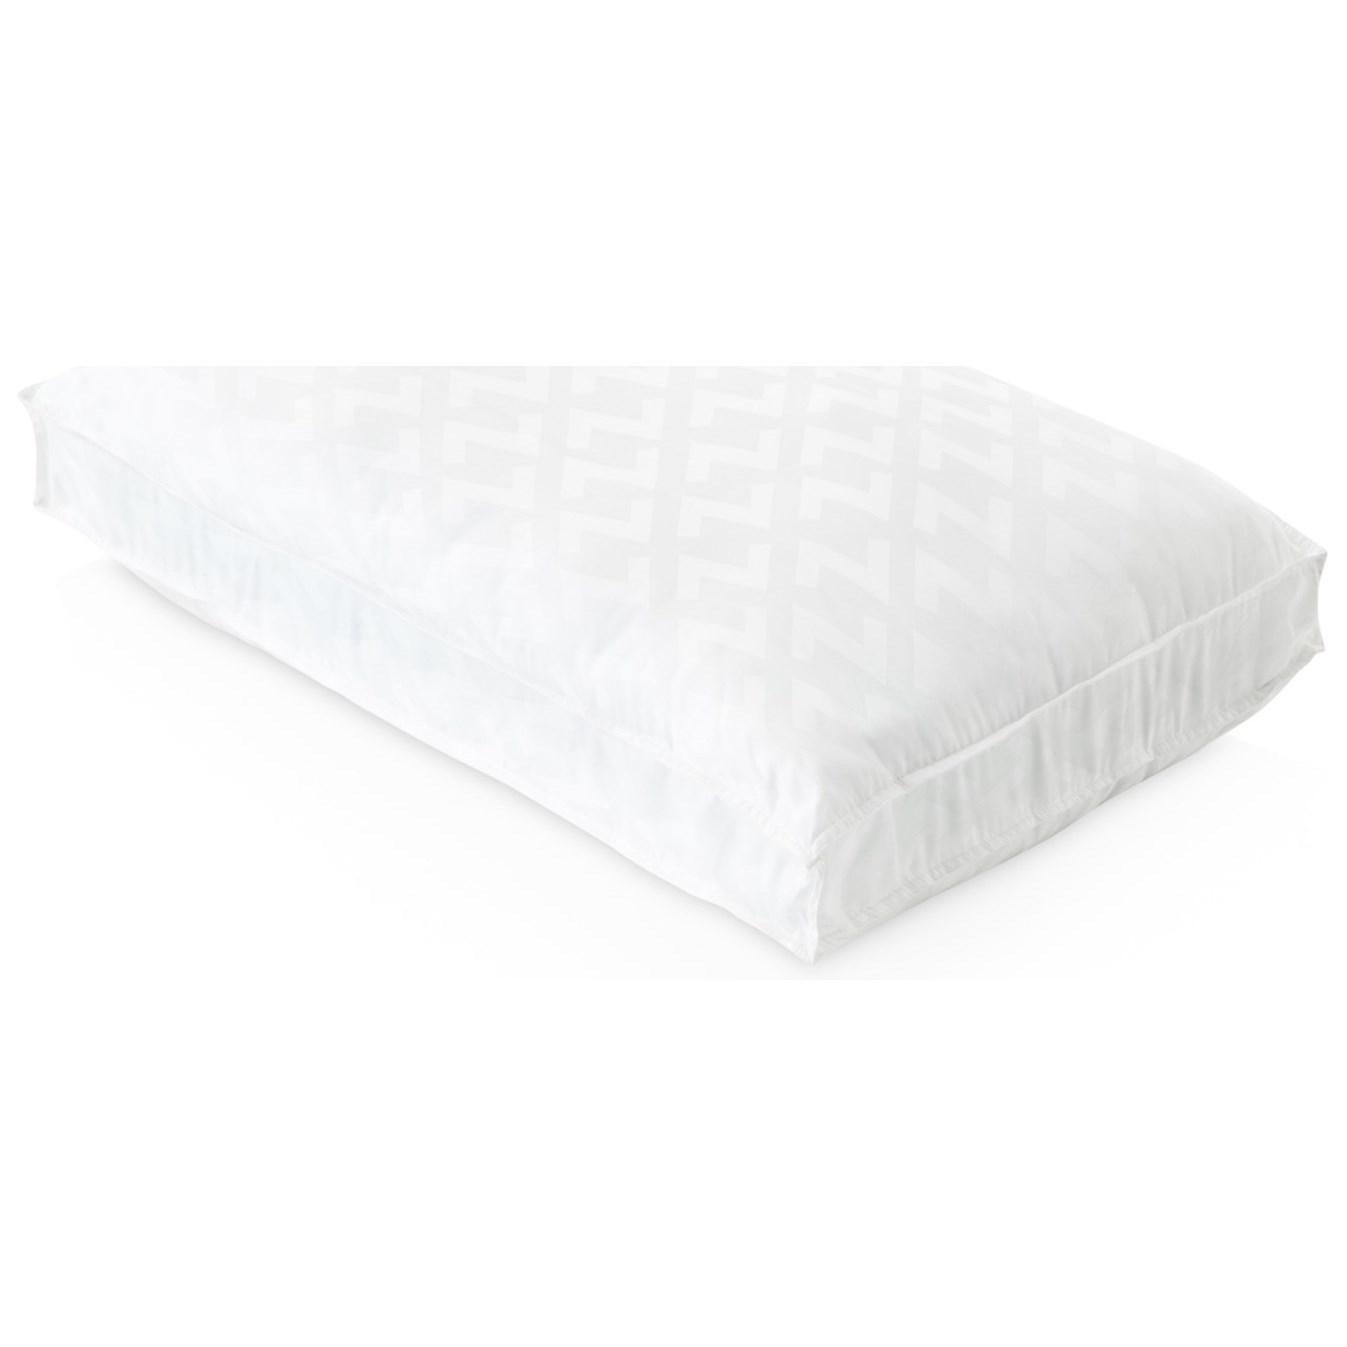 Malouf Gel Convolution™ Queen Gel Convolution™ High Loft Pillow - Item Number: ZZQQHPCOGF